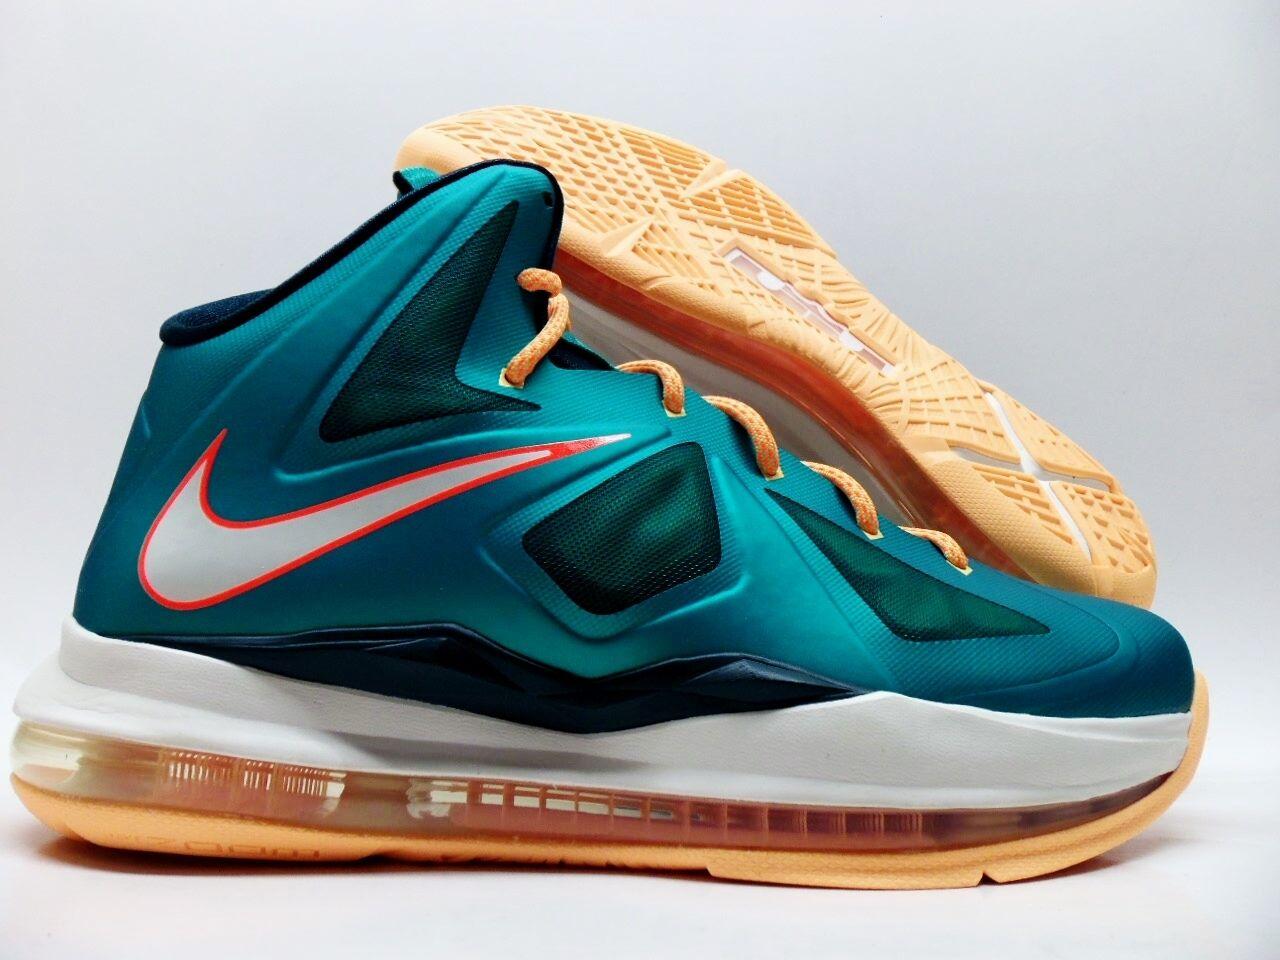 Nike lebron x (gs) basket verde atomica / arancio, sz / donne 8 [543564-302]